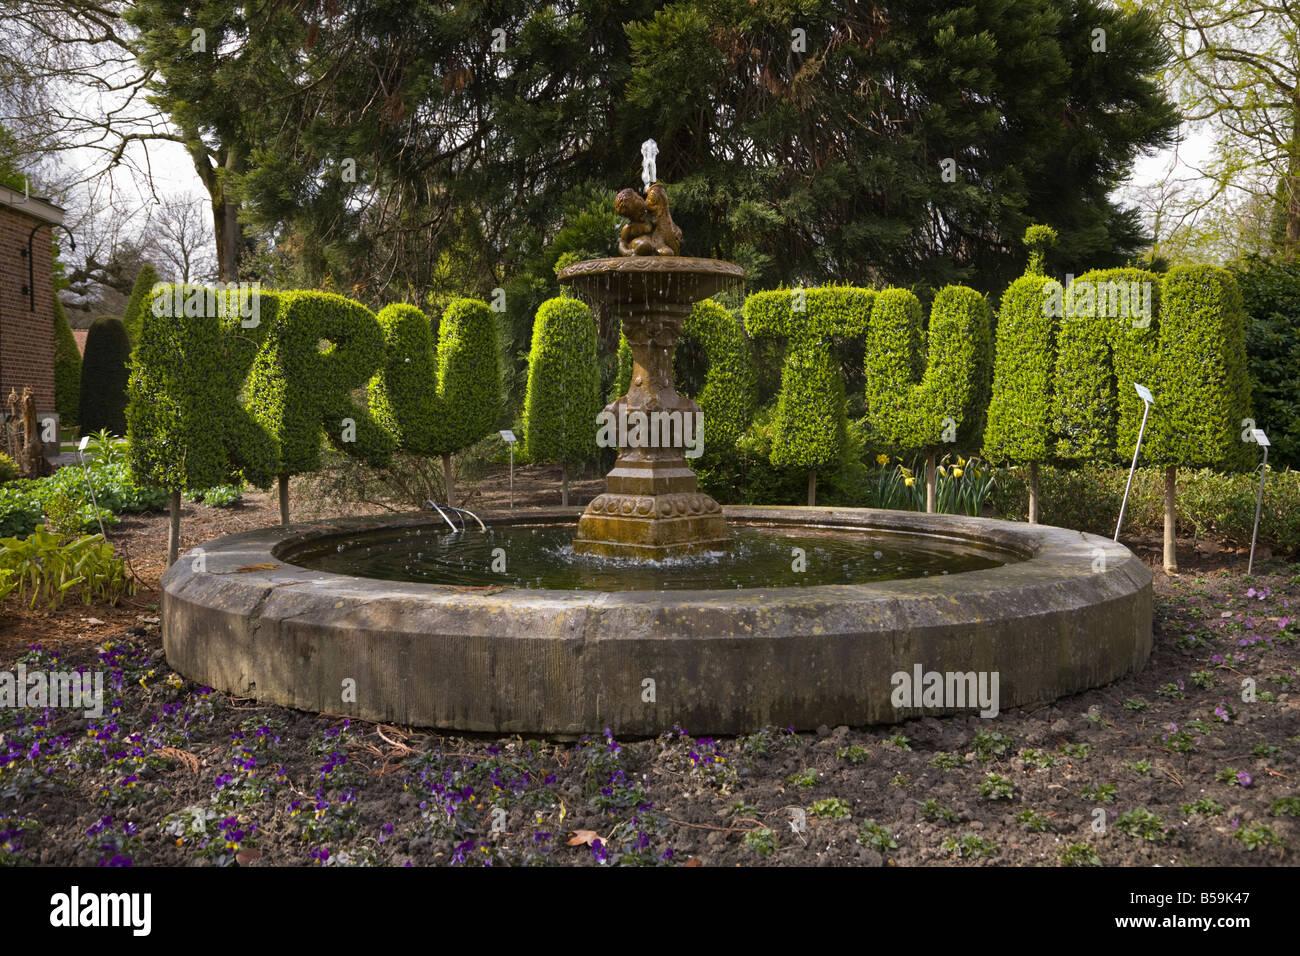 Topiary spelling the word Kruidtuin in Leuven Botanic Kruidtuin ...